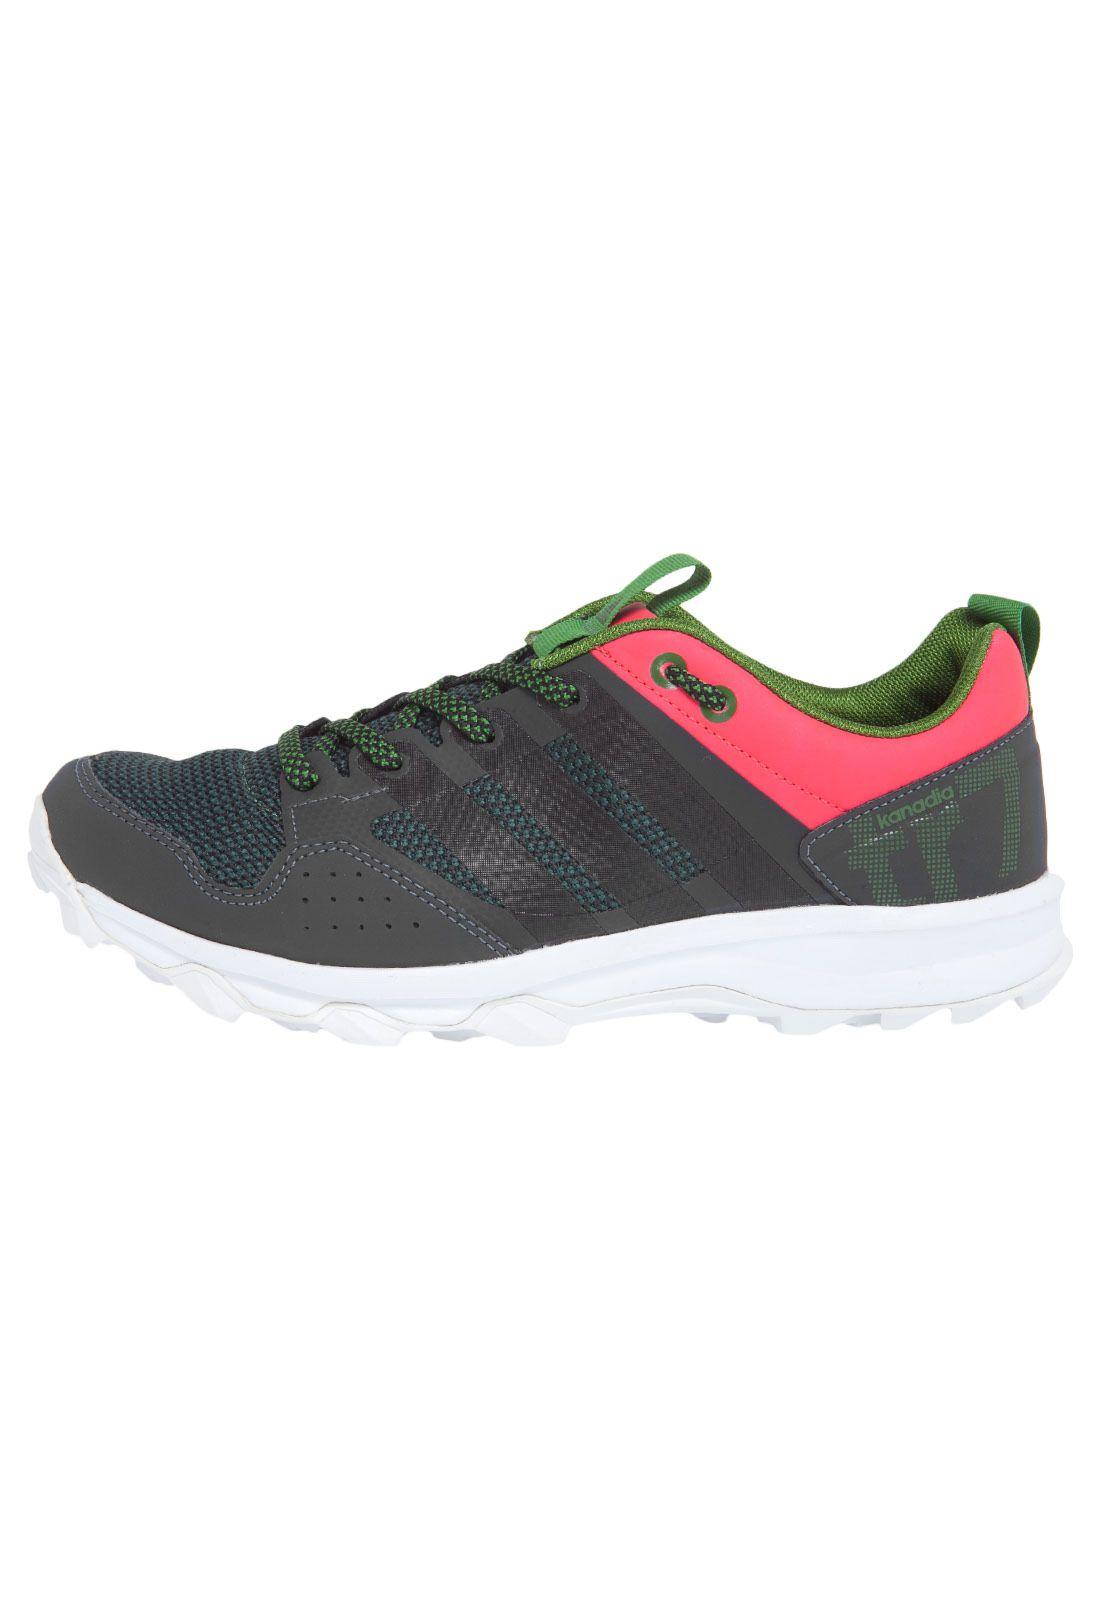 Tênis Adidas Kanadia 7 Tr W Cinza N.39